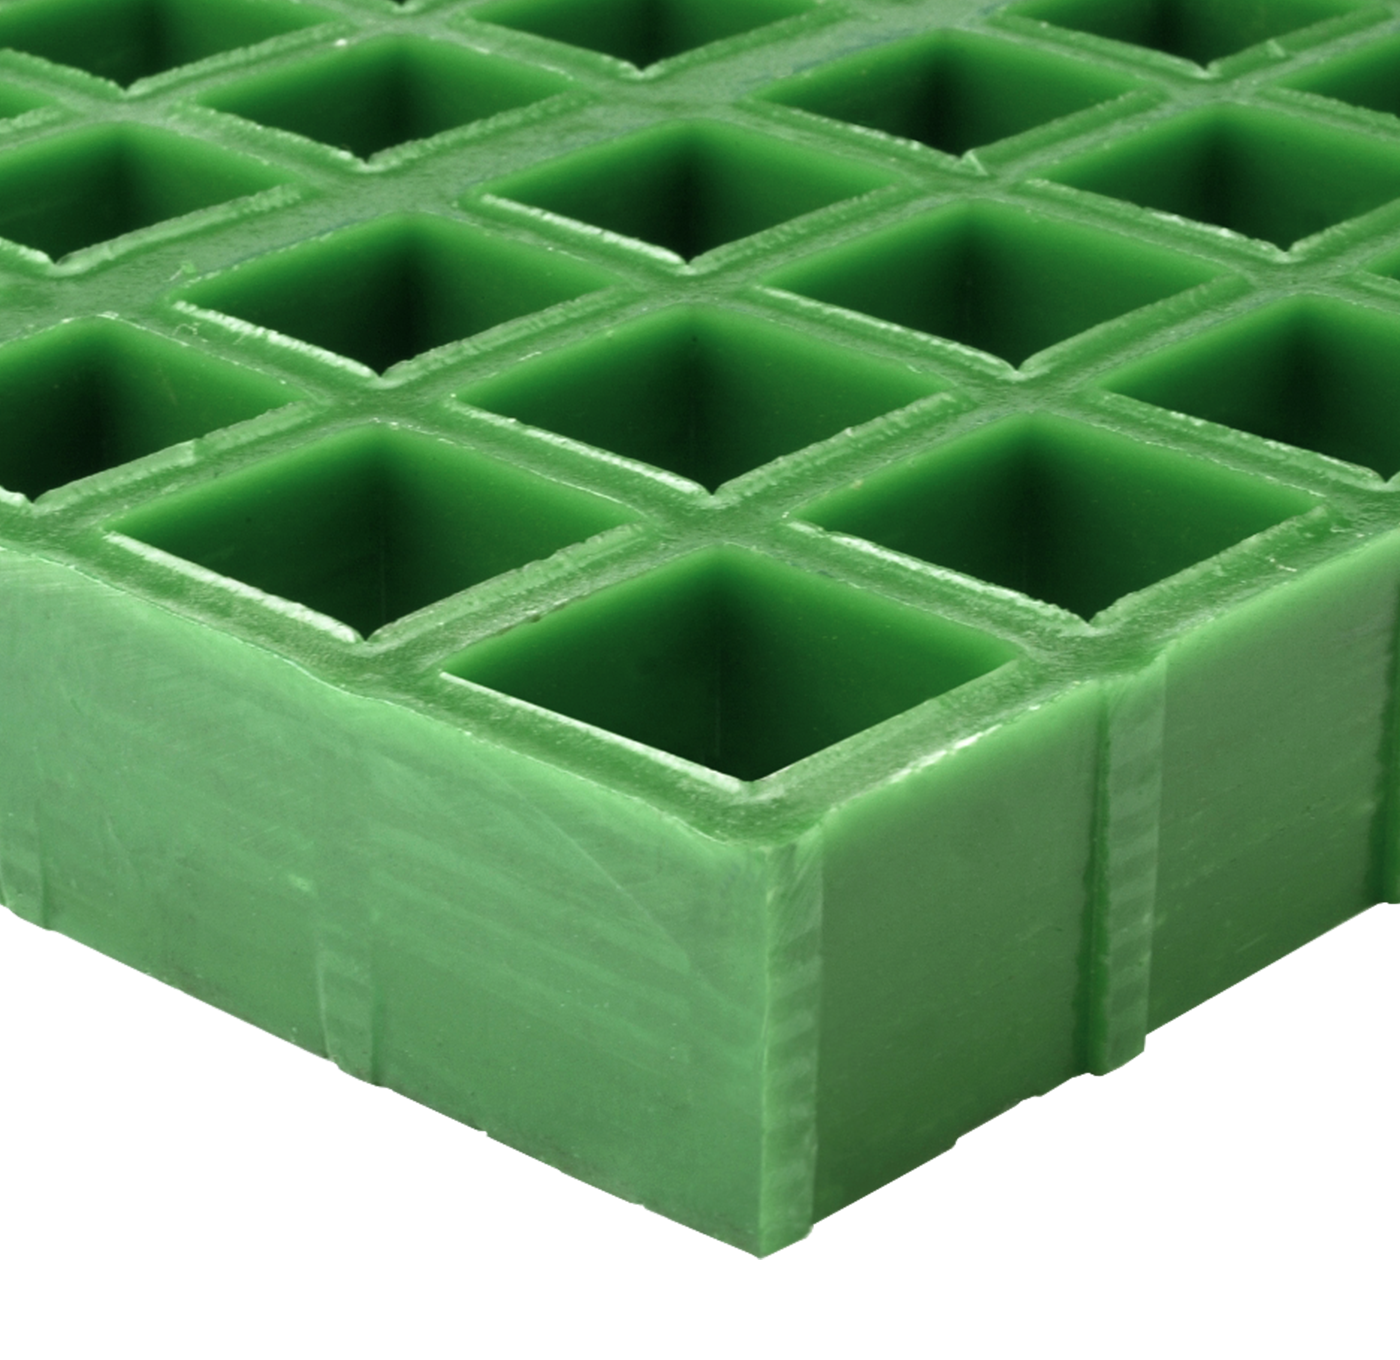 Grön GRP plastdurk